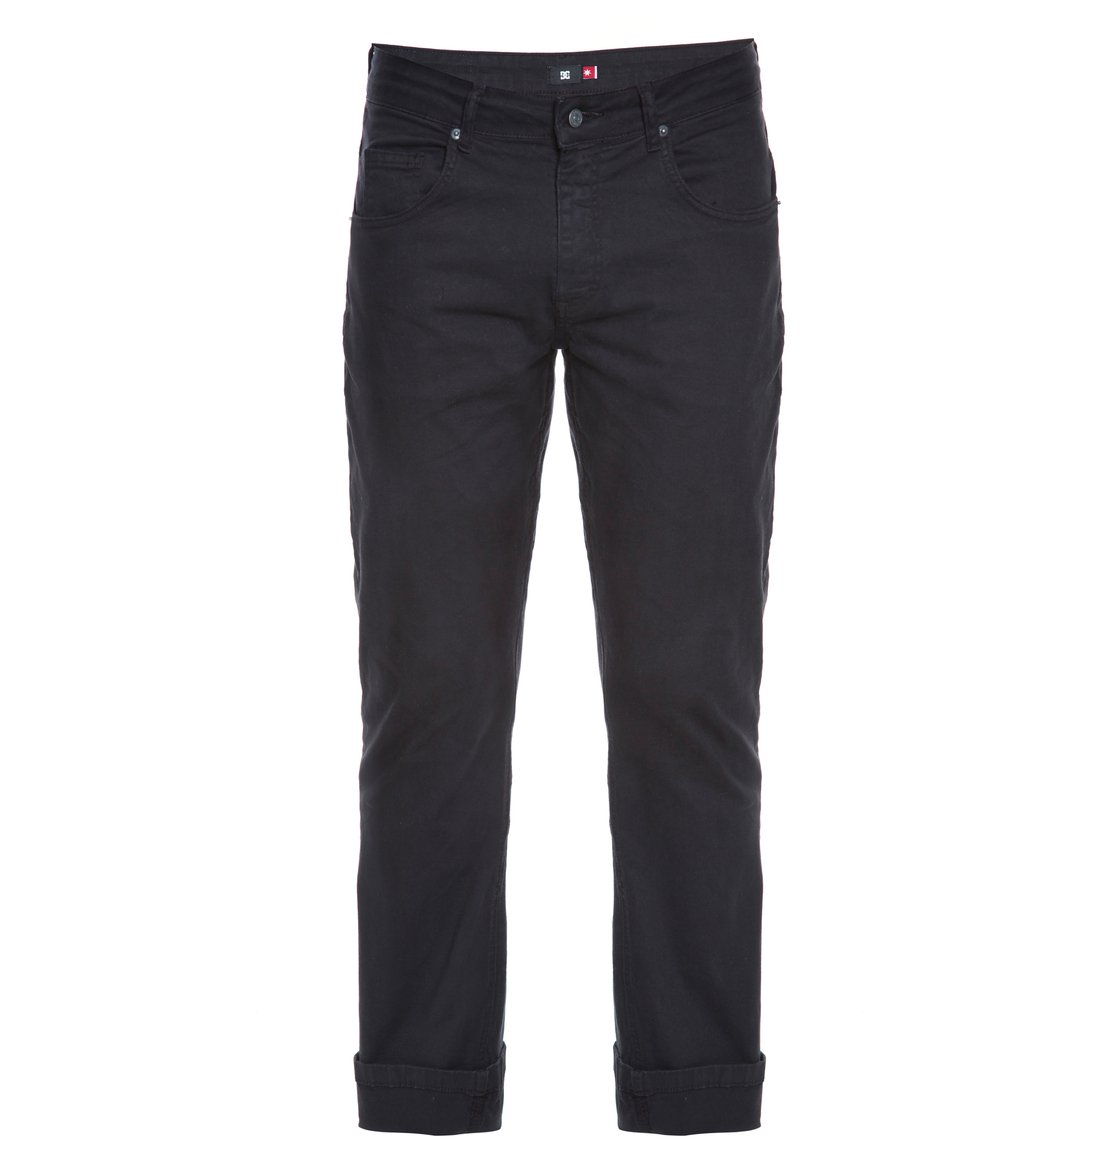 0 Calça Jeans masculina Slim Core BR63331506 DC Shoes d486534c2e6